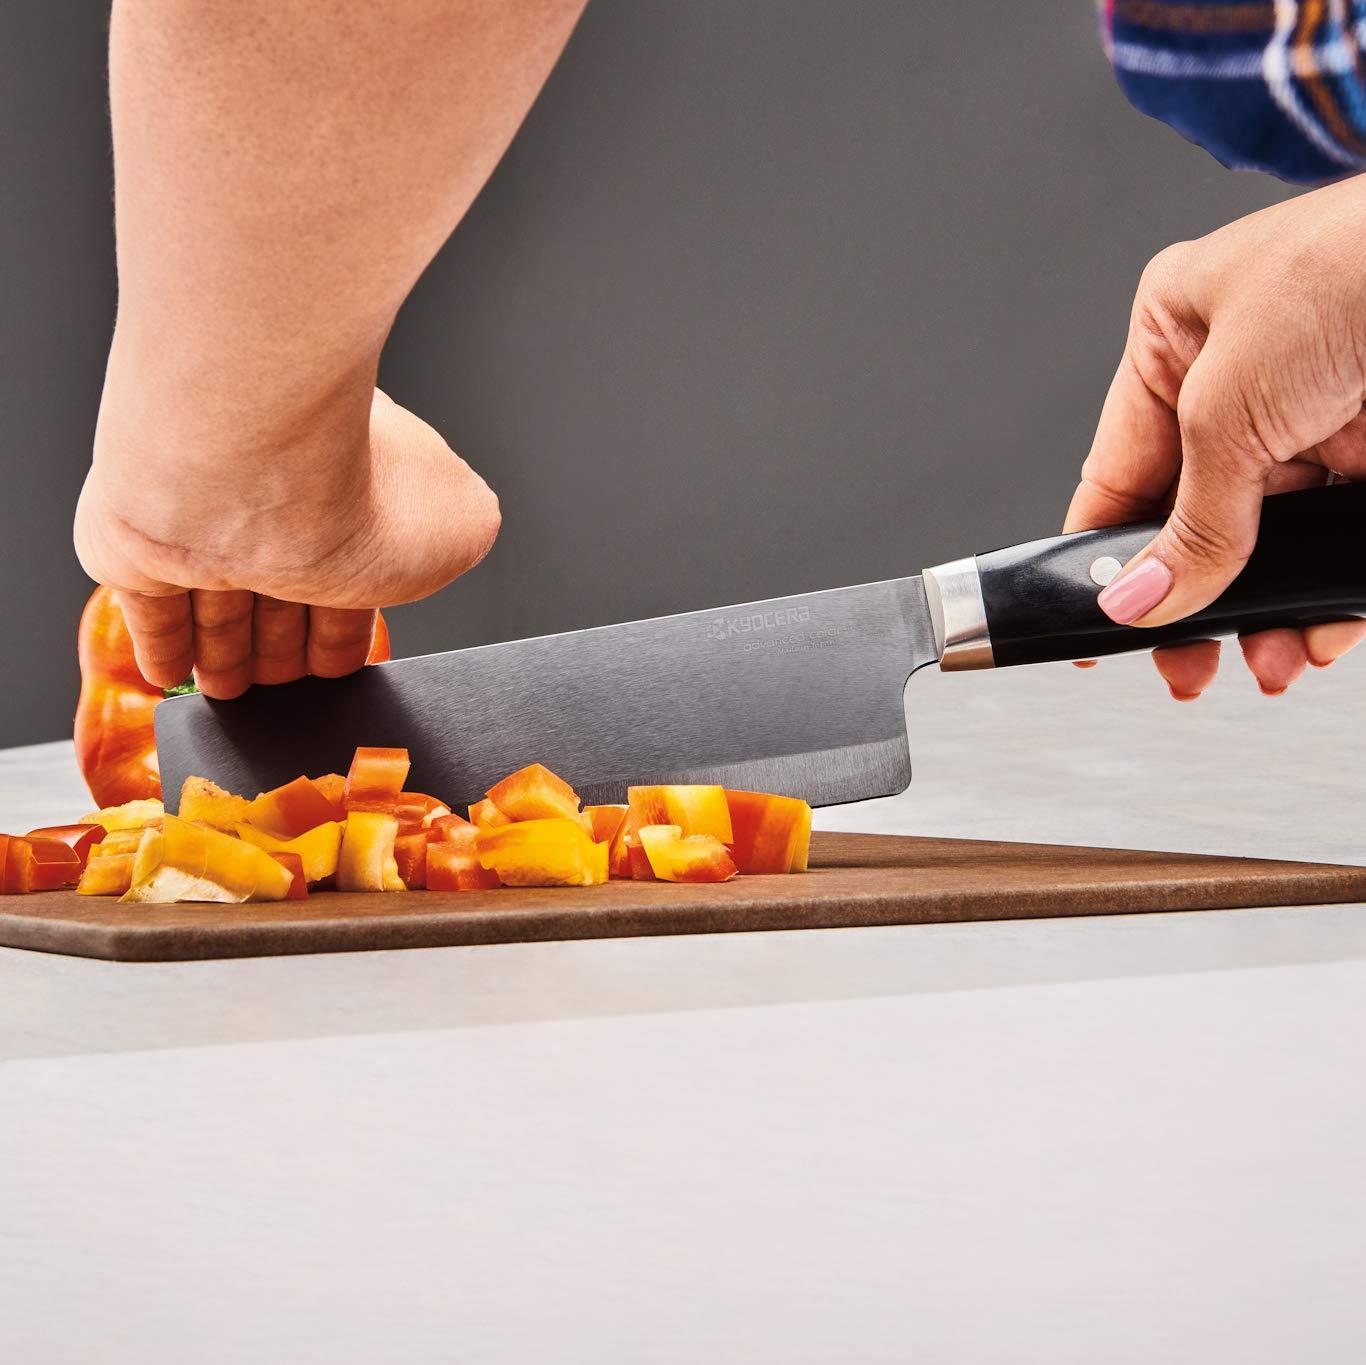 Kyocera Advanced Ceramic LTD Series Nakiri Knife with Handcrafted Pakka Wood Handle, 6-Inch, Black Blade by Kyocera (Image #3)